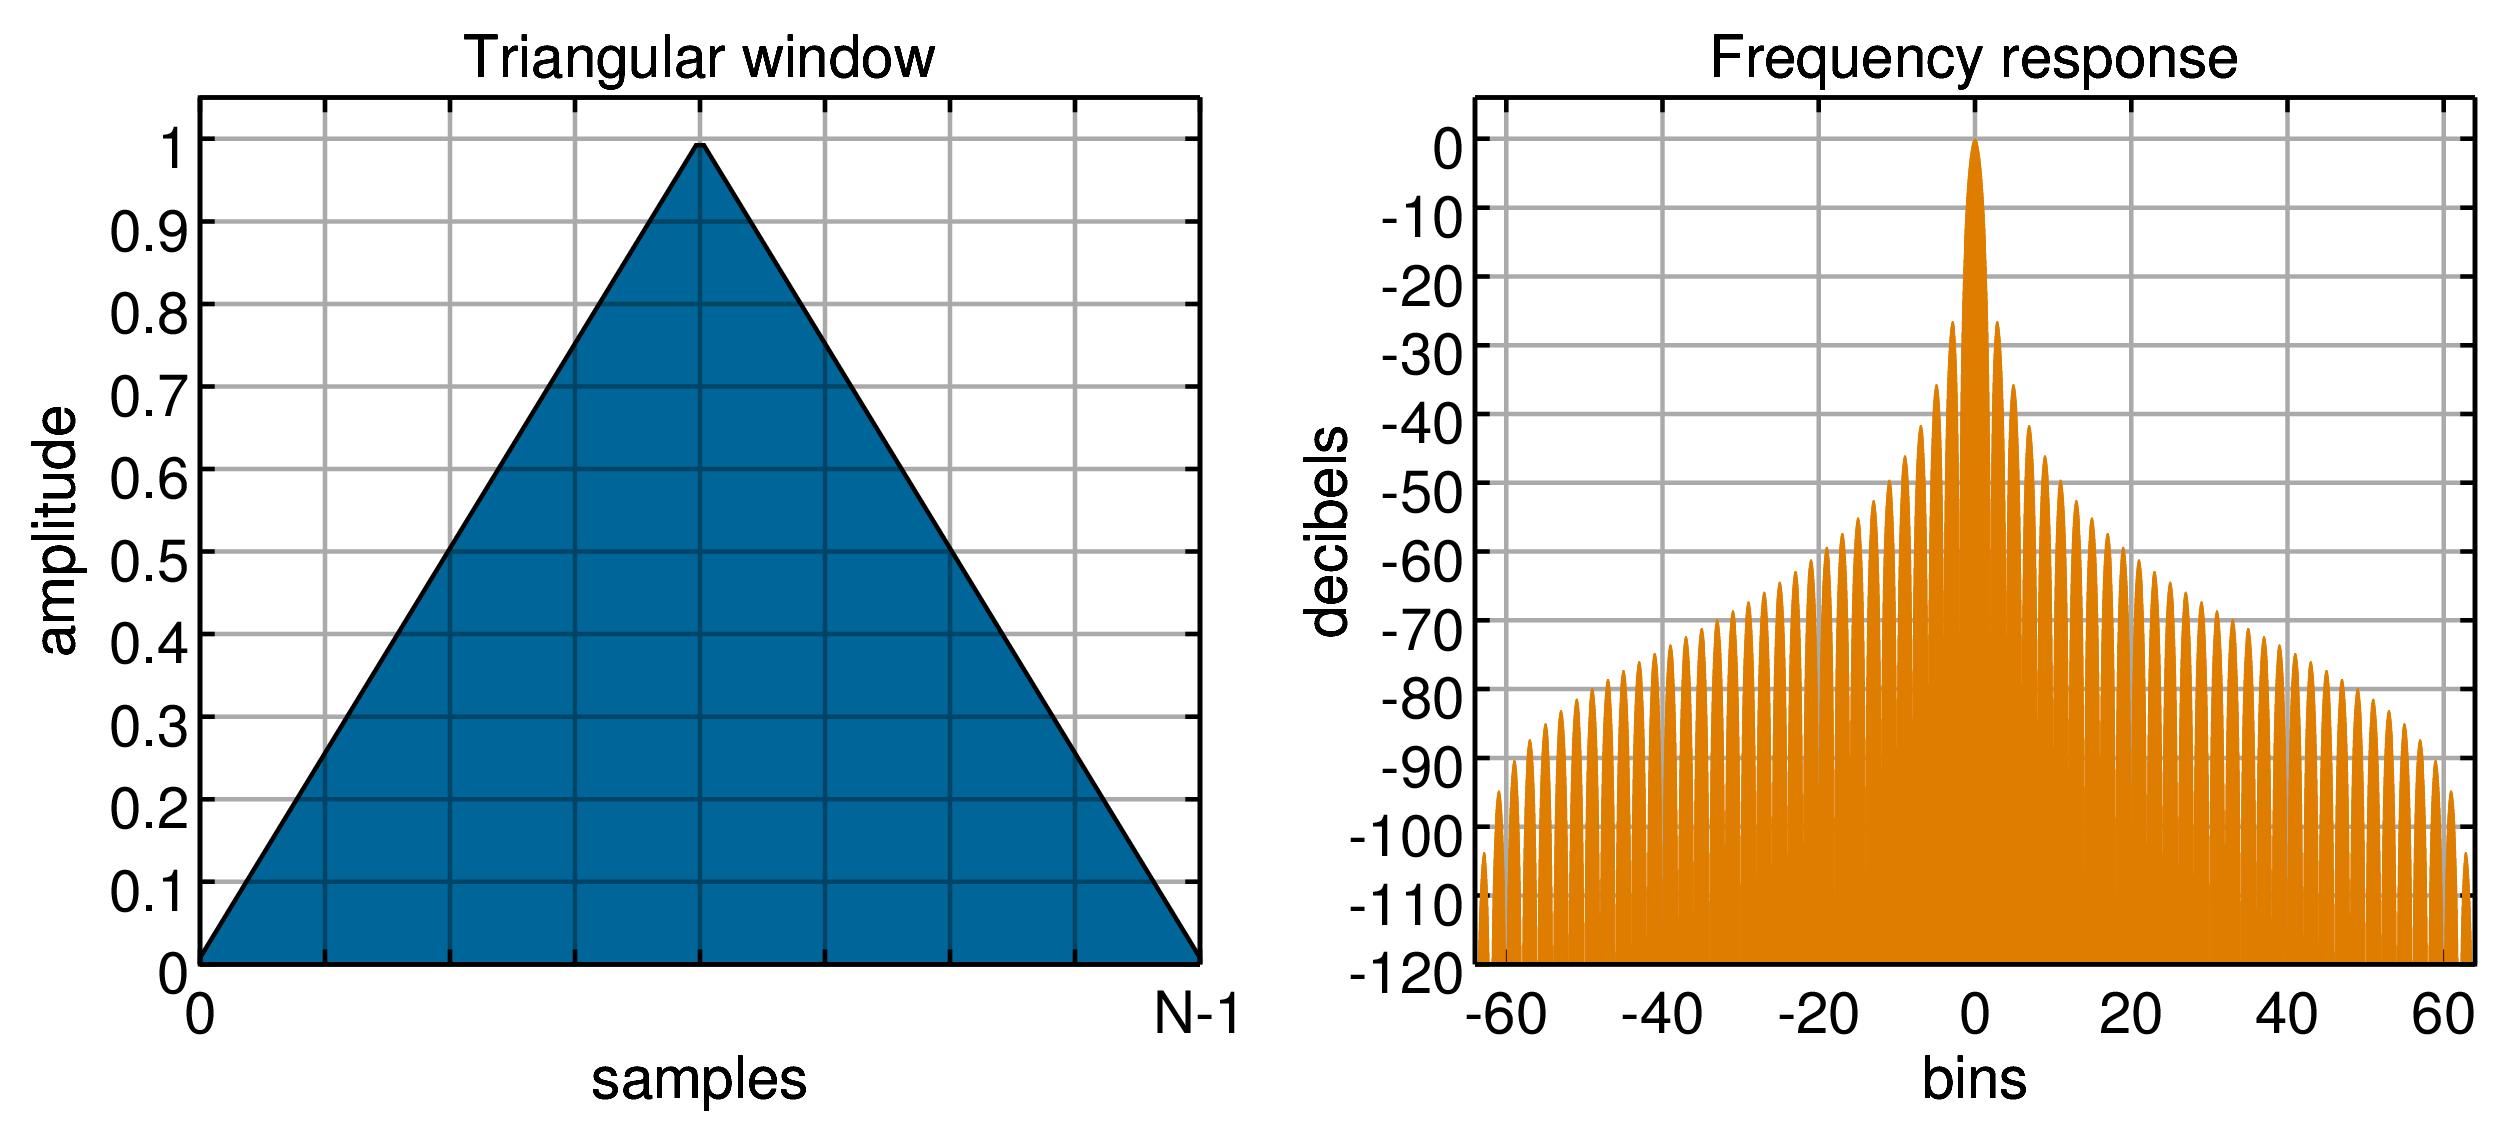 http://upload.wikimedia.org/wikipedia/commons/9/97/Window_function_%28triangular%29.png